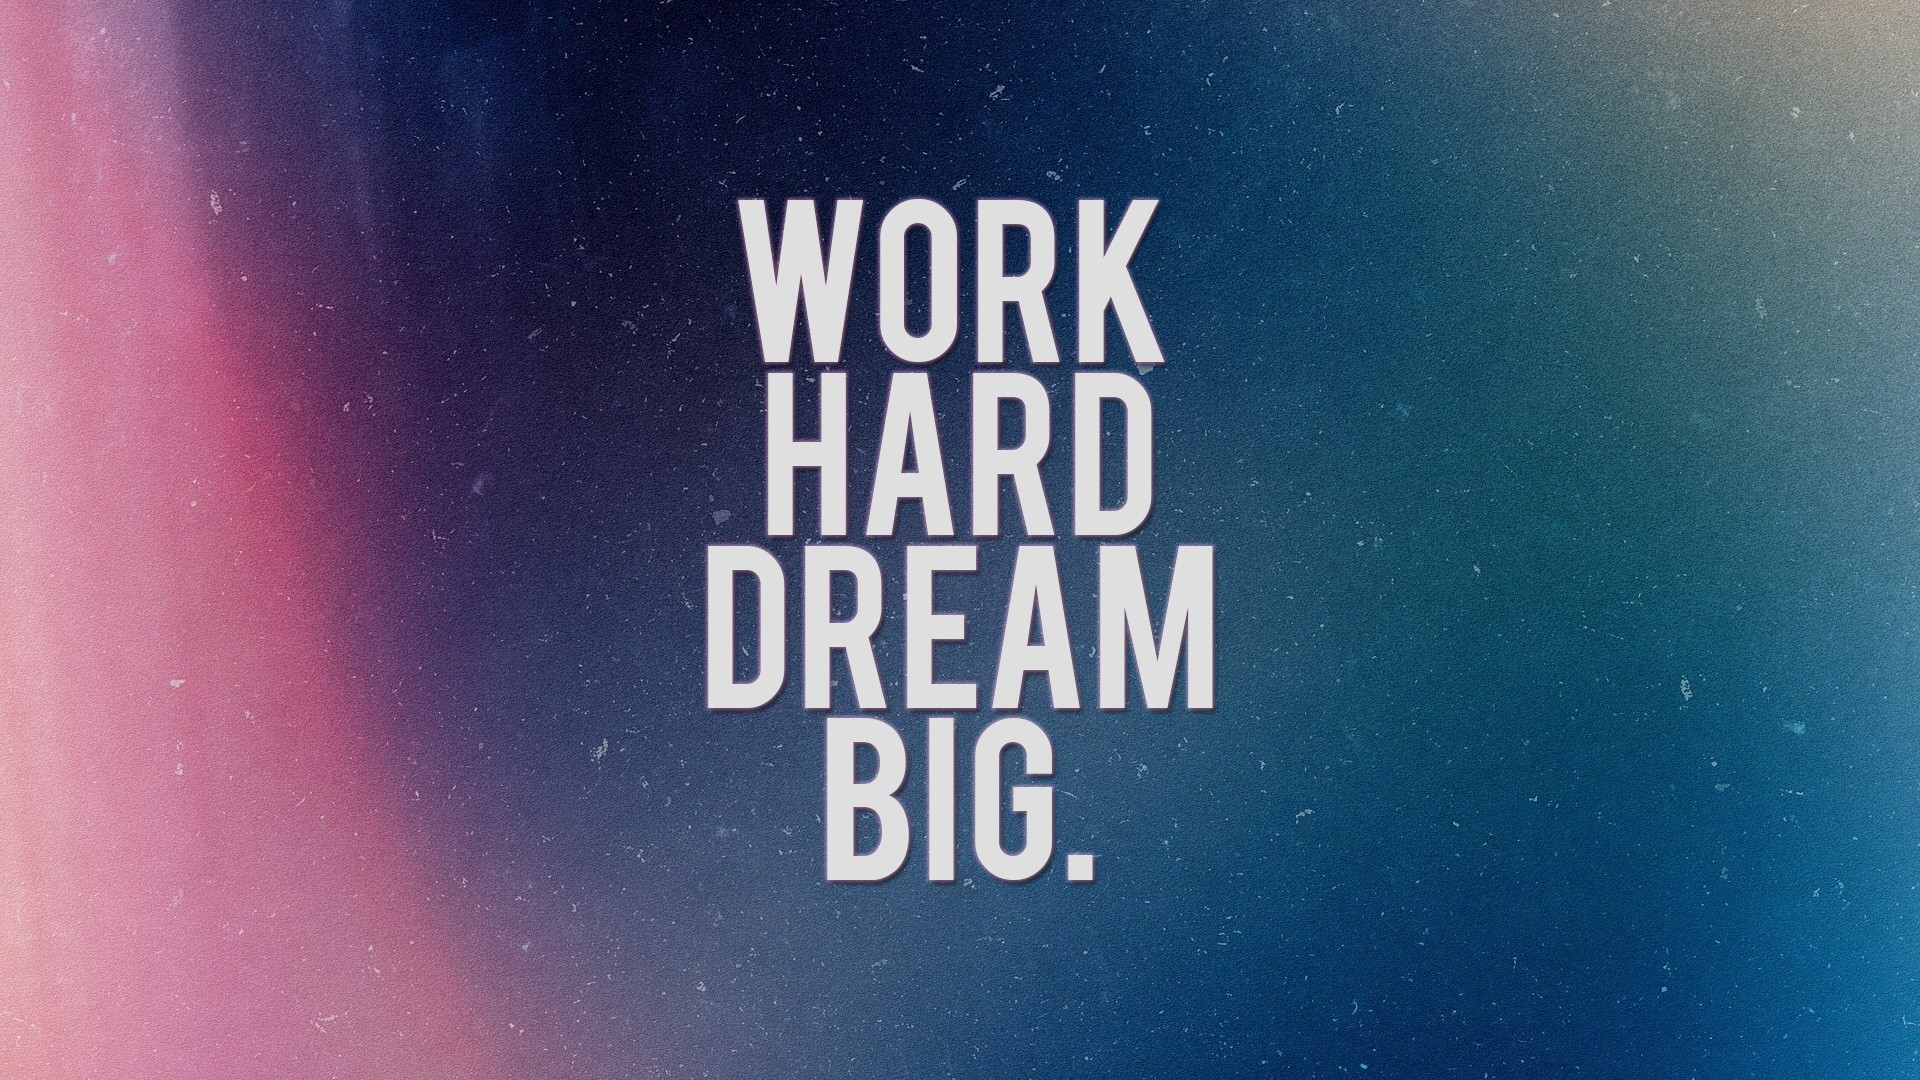 1920x1080 Work Hard Dream Big.